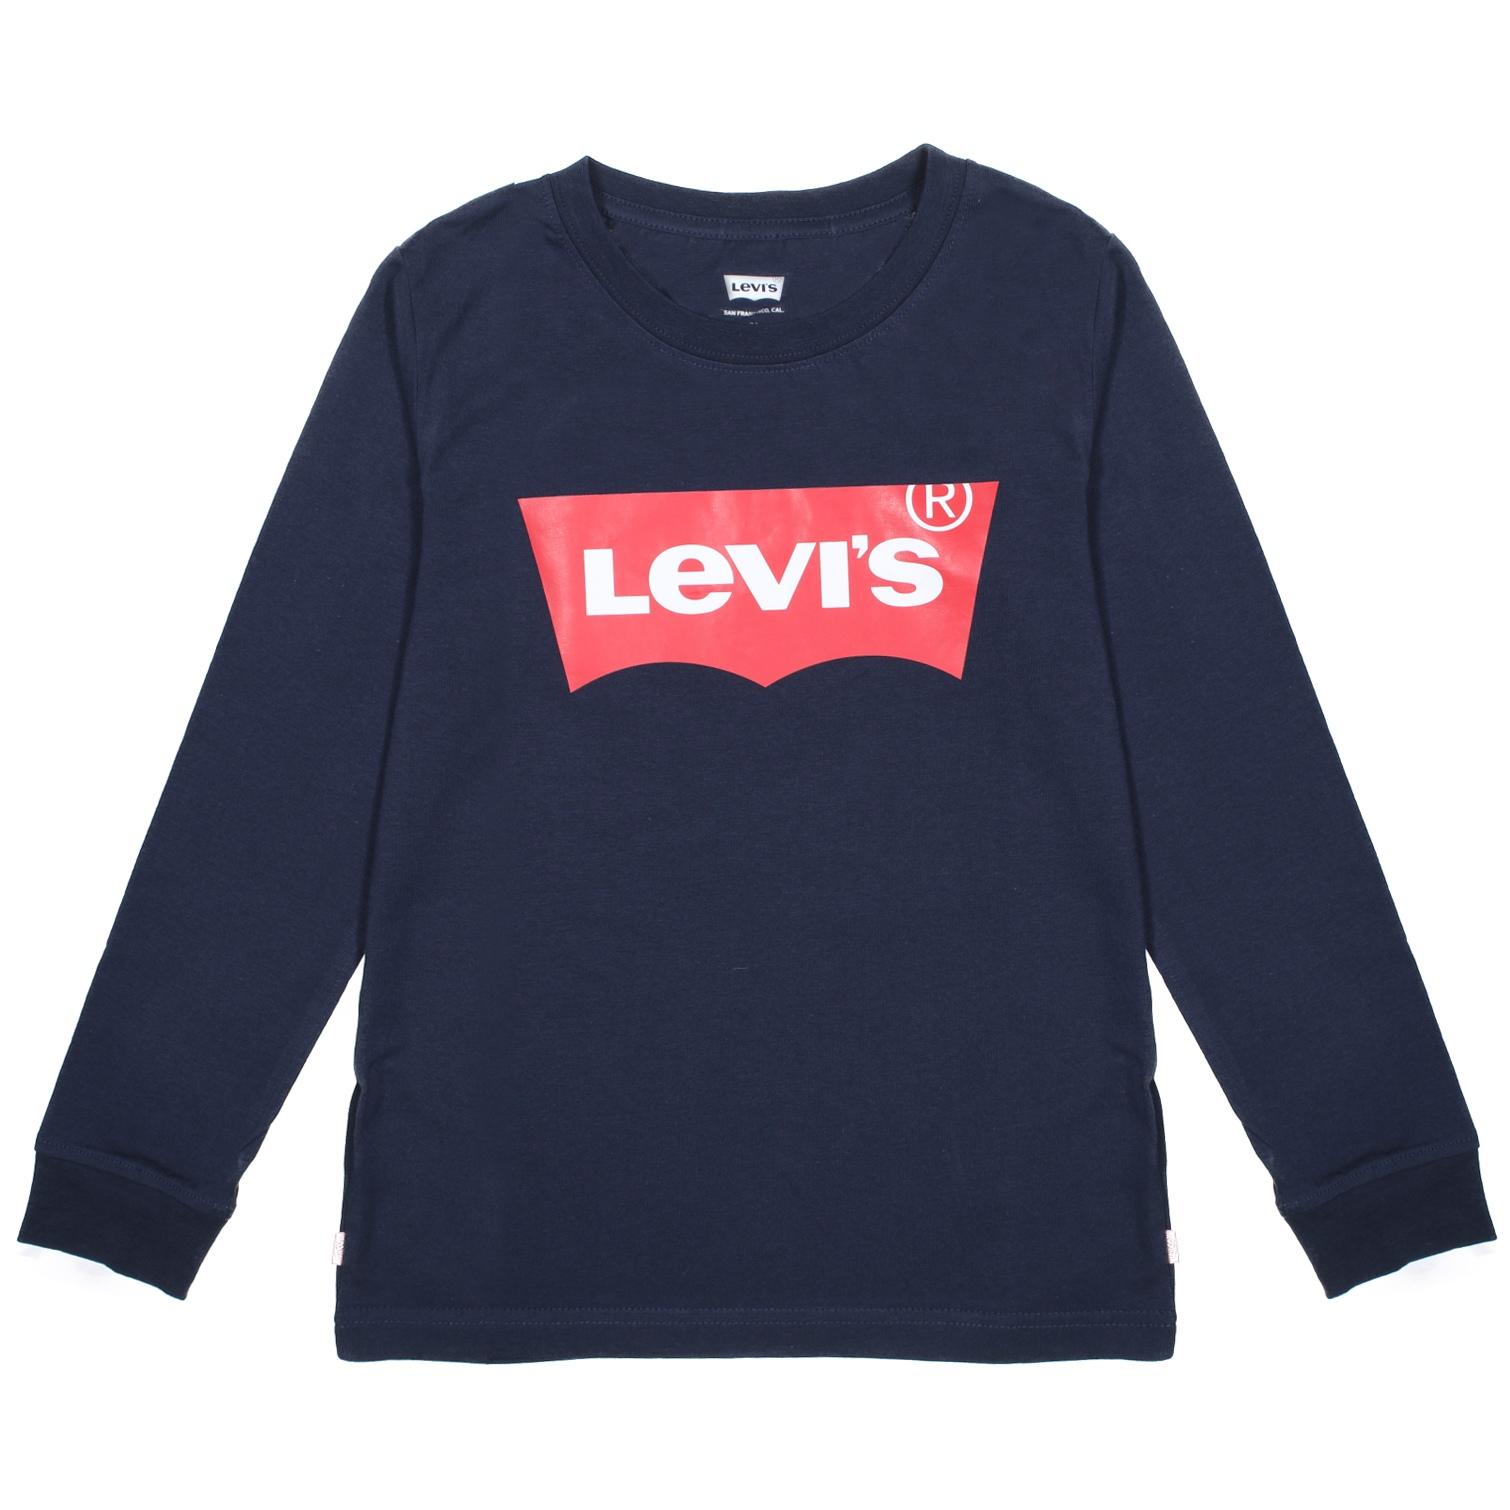 https://www.leadermode.com/183713/levi-s-kids-8646-u09-dress-blue.jpg